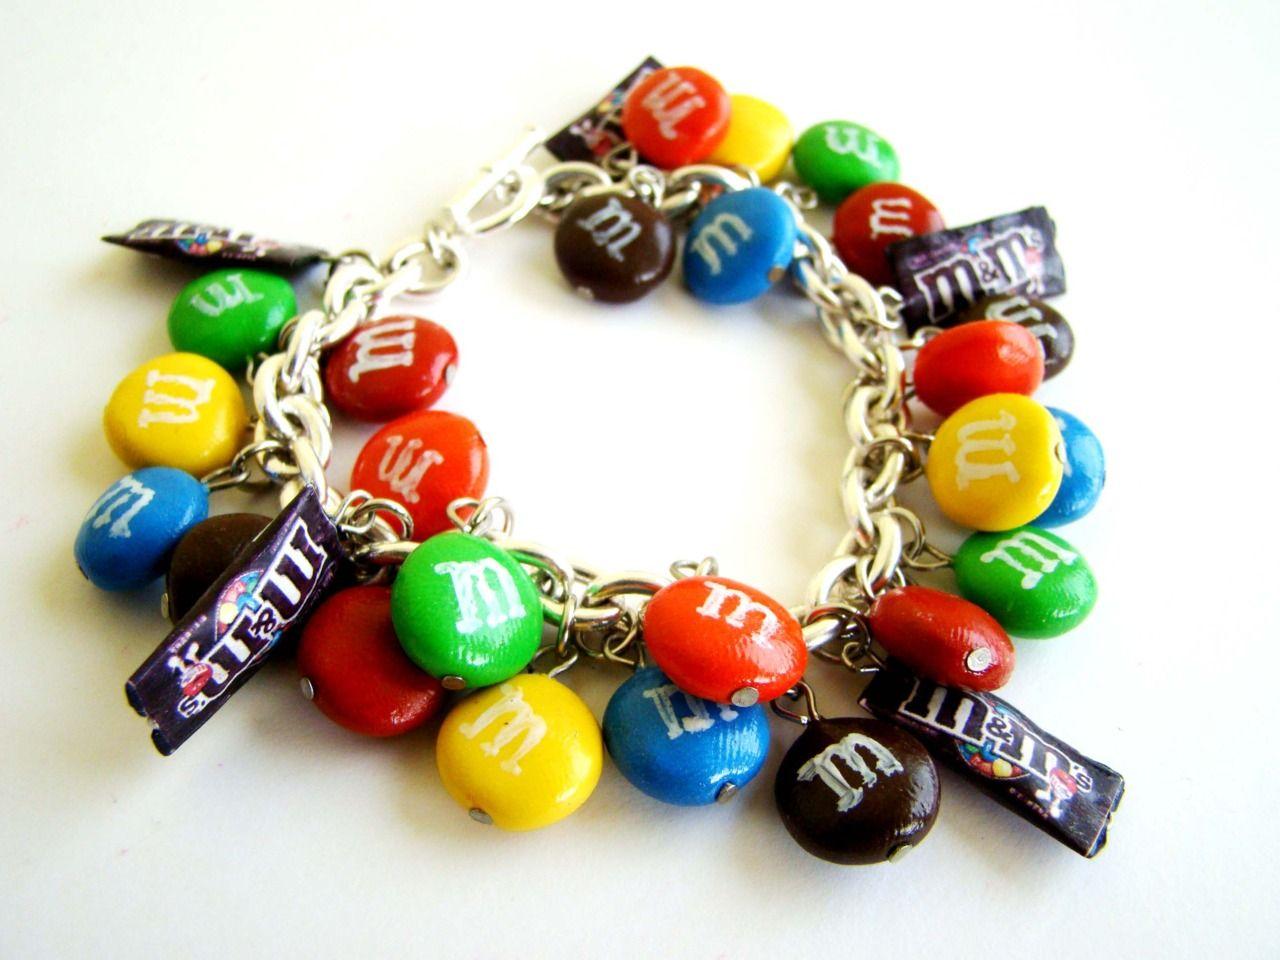 Handmade Mm S Inspired Bracelet Diy Polymer Clay Food Cans Cute Miniature Idea Charm